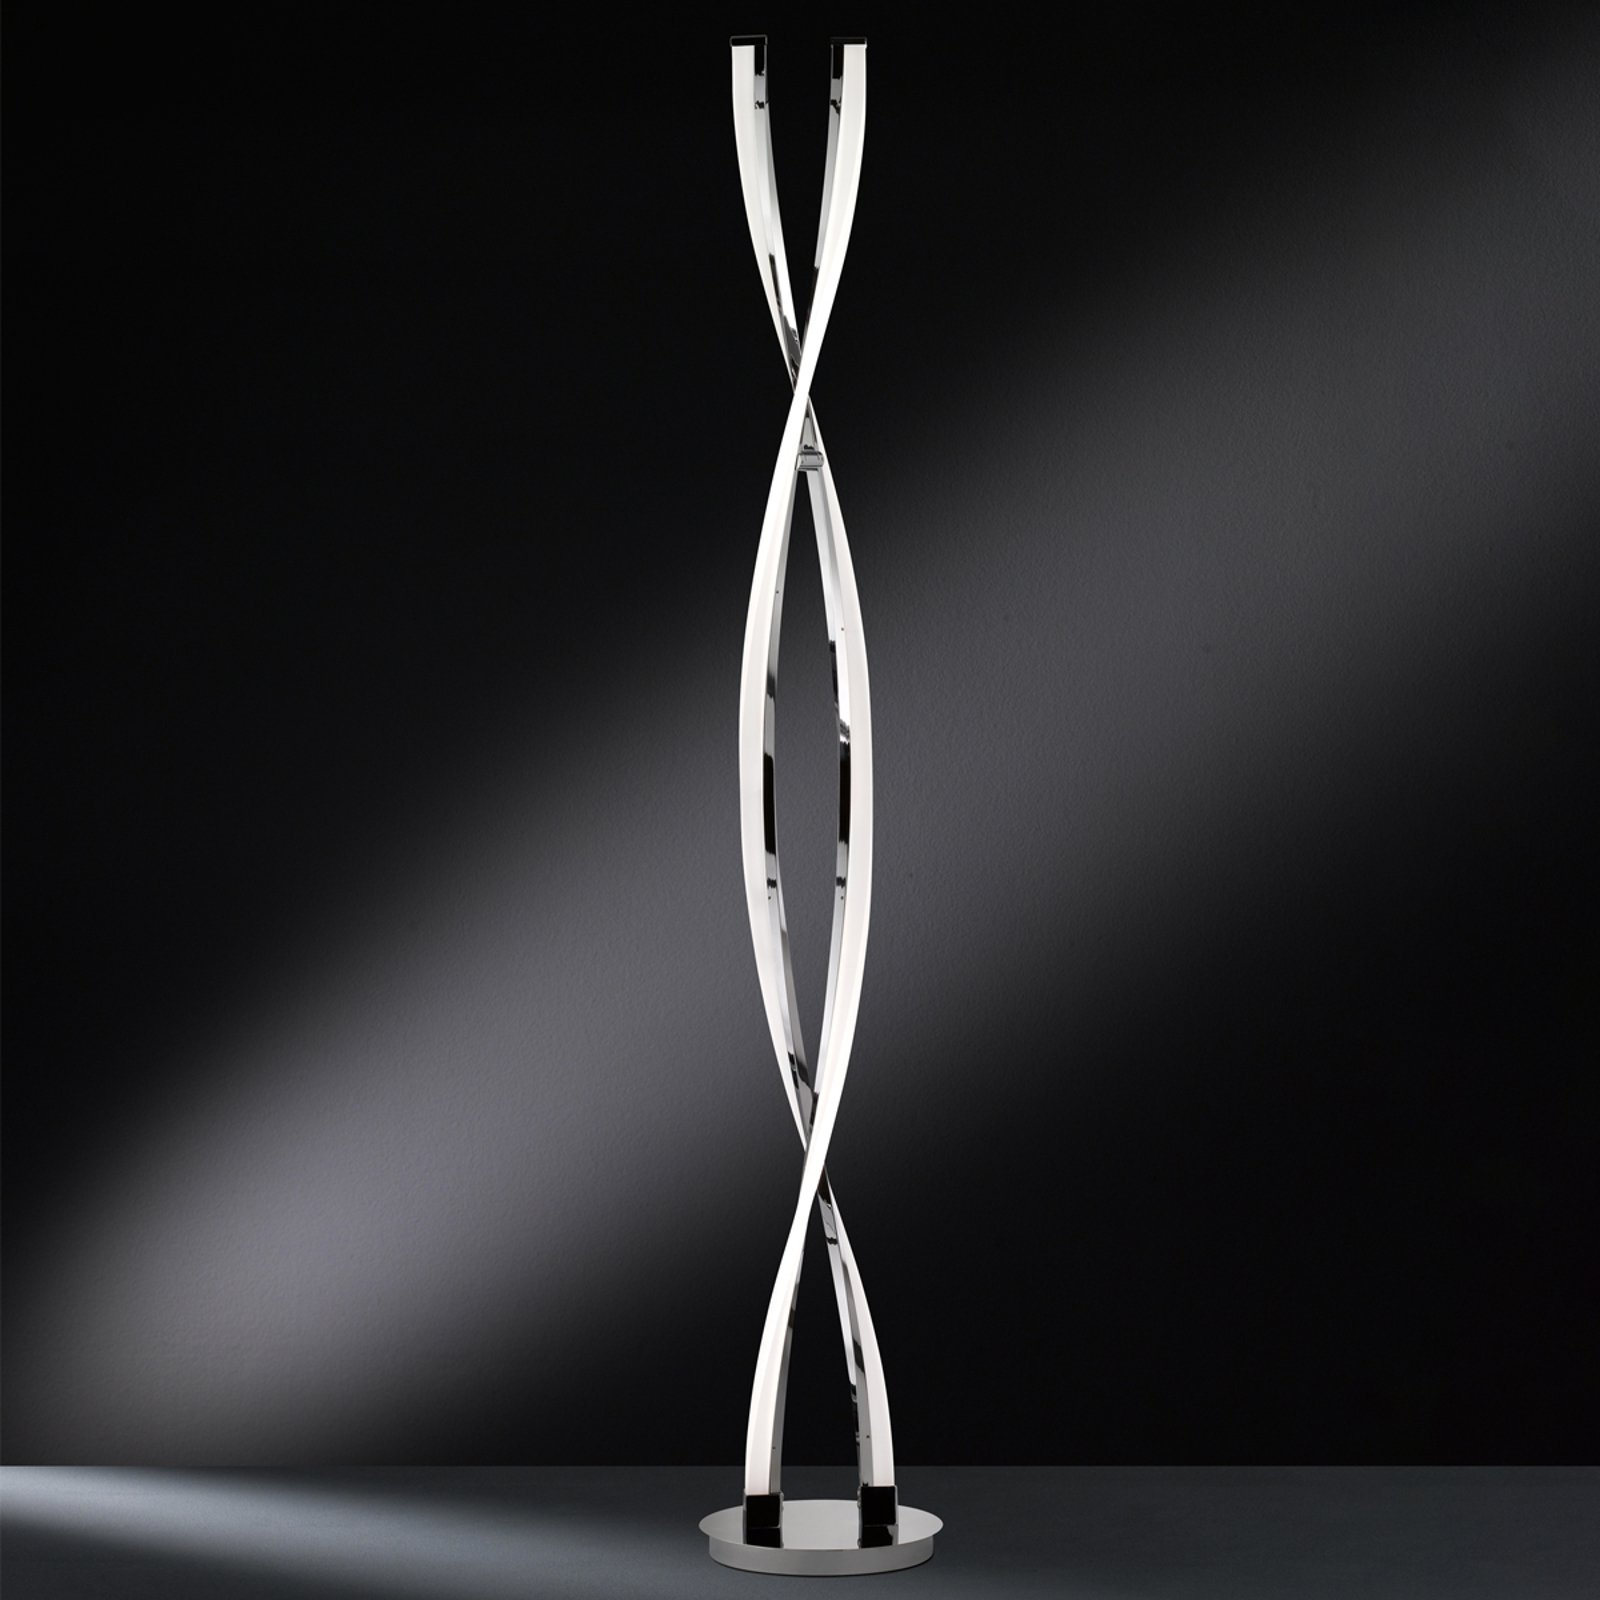 Trinnløs dimbar LED-stålampe Idana